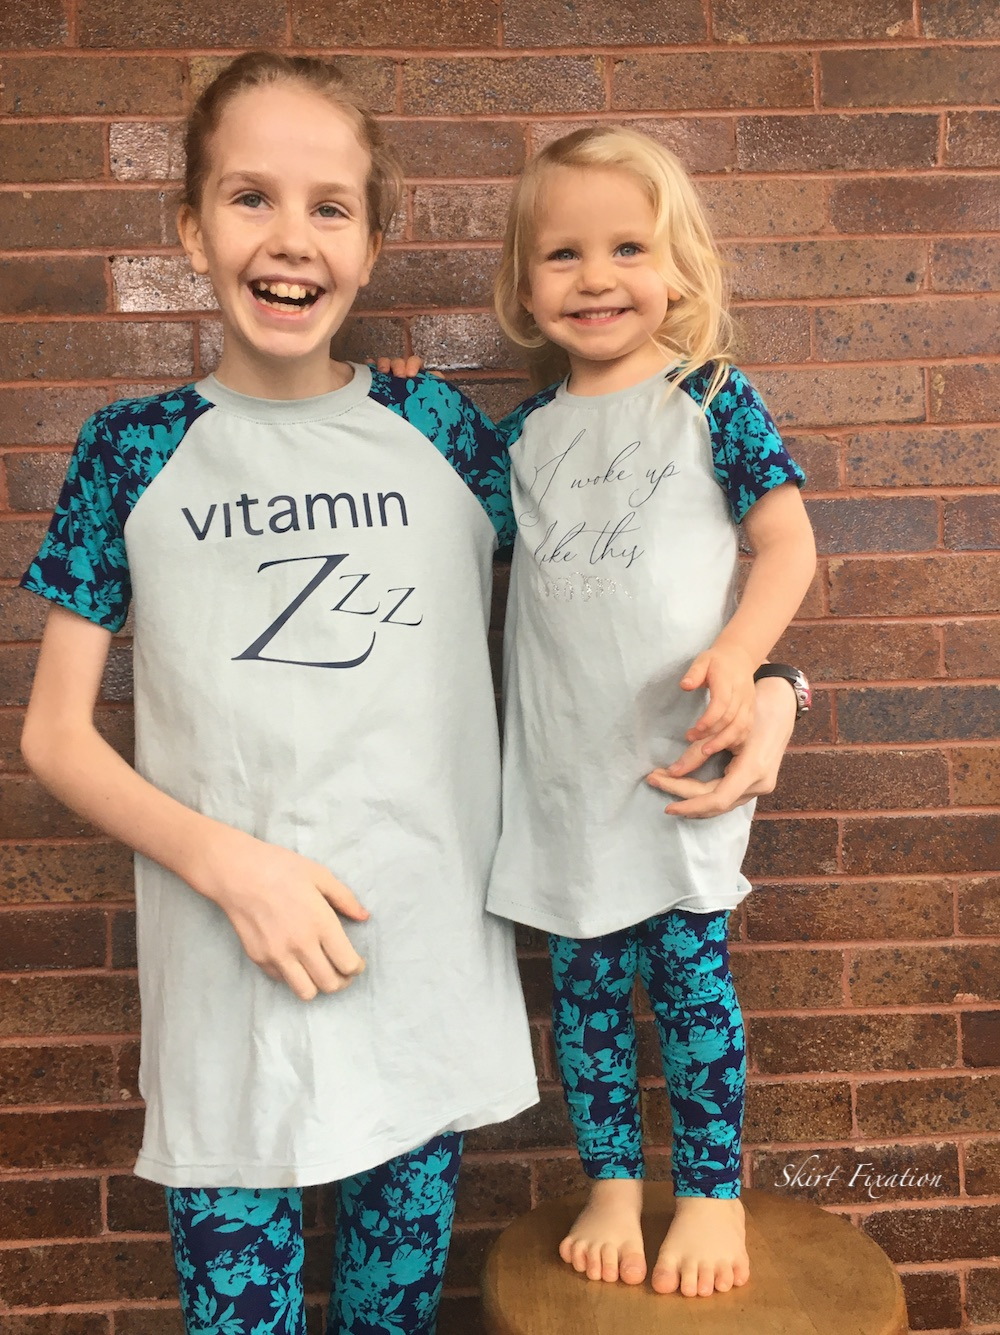 Vitamin Z pajama shirt created and sewn by Skirt Fixation